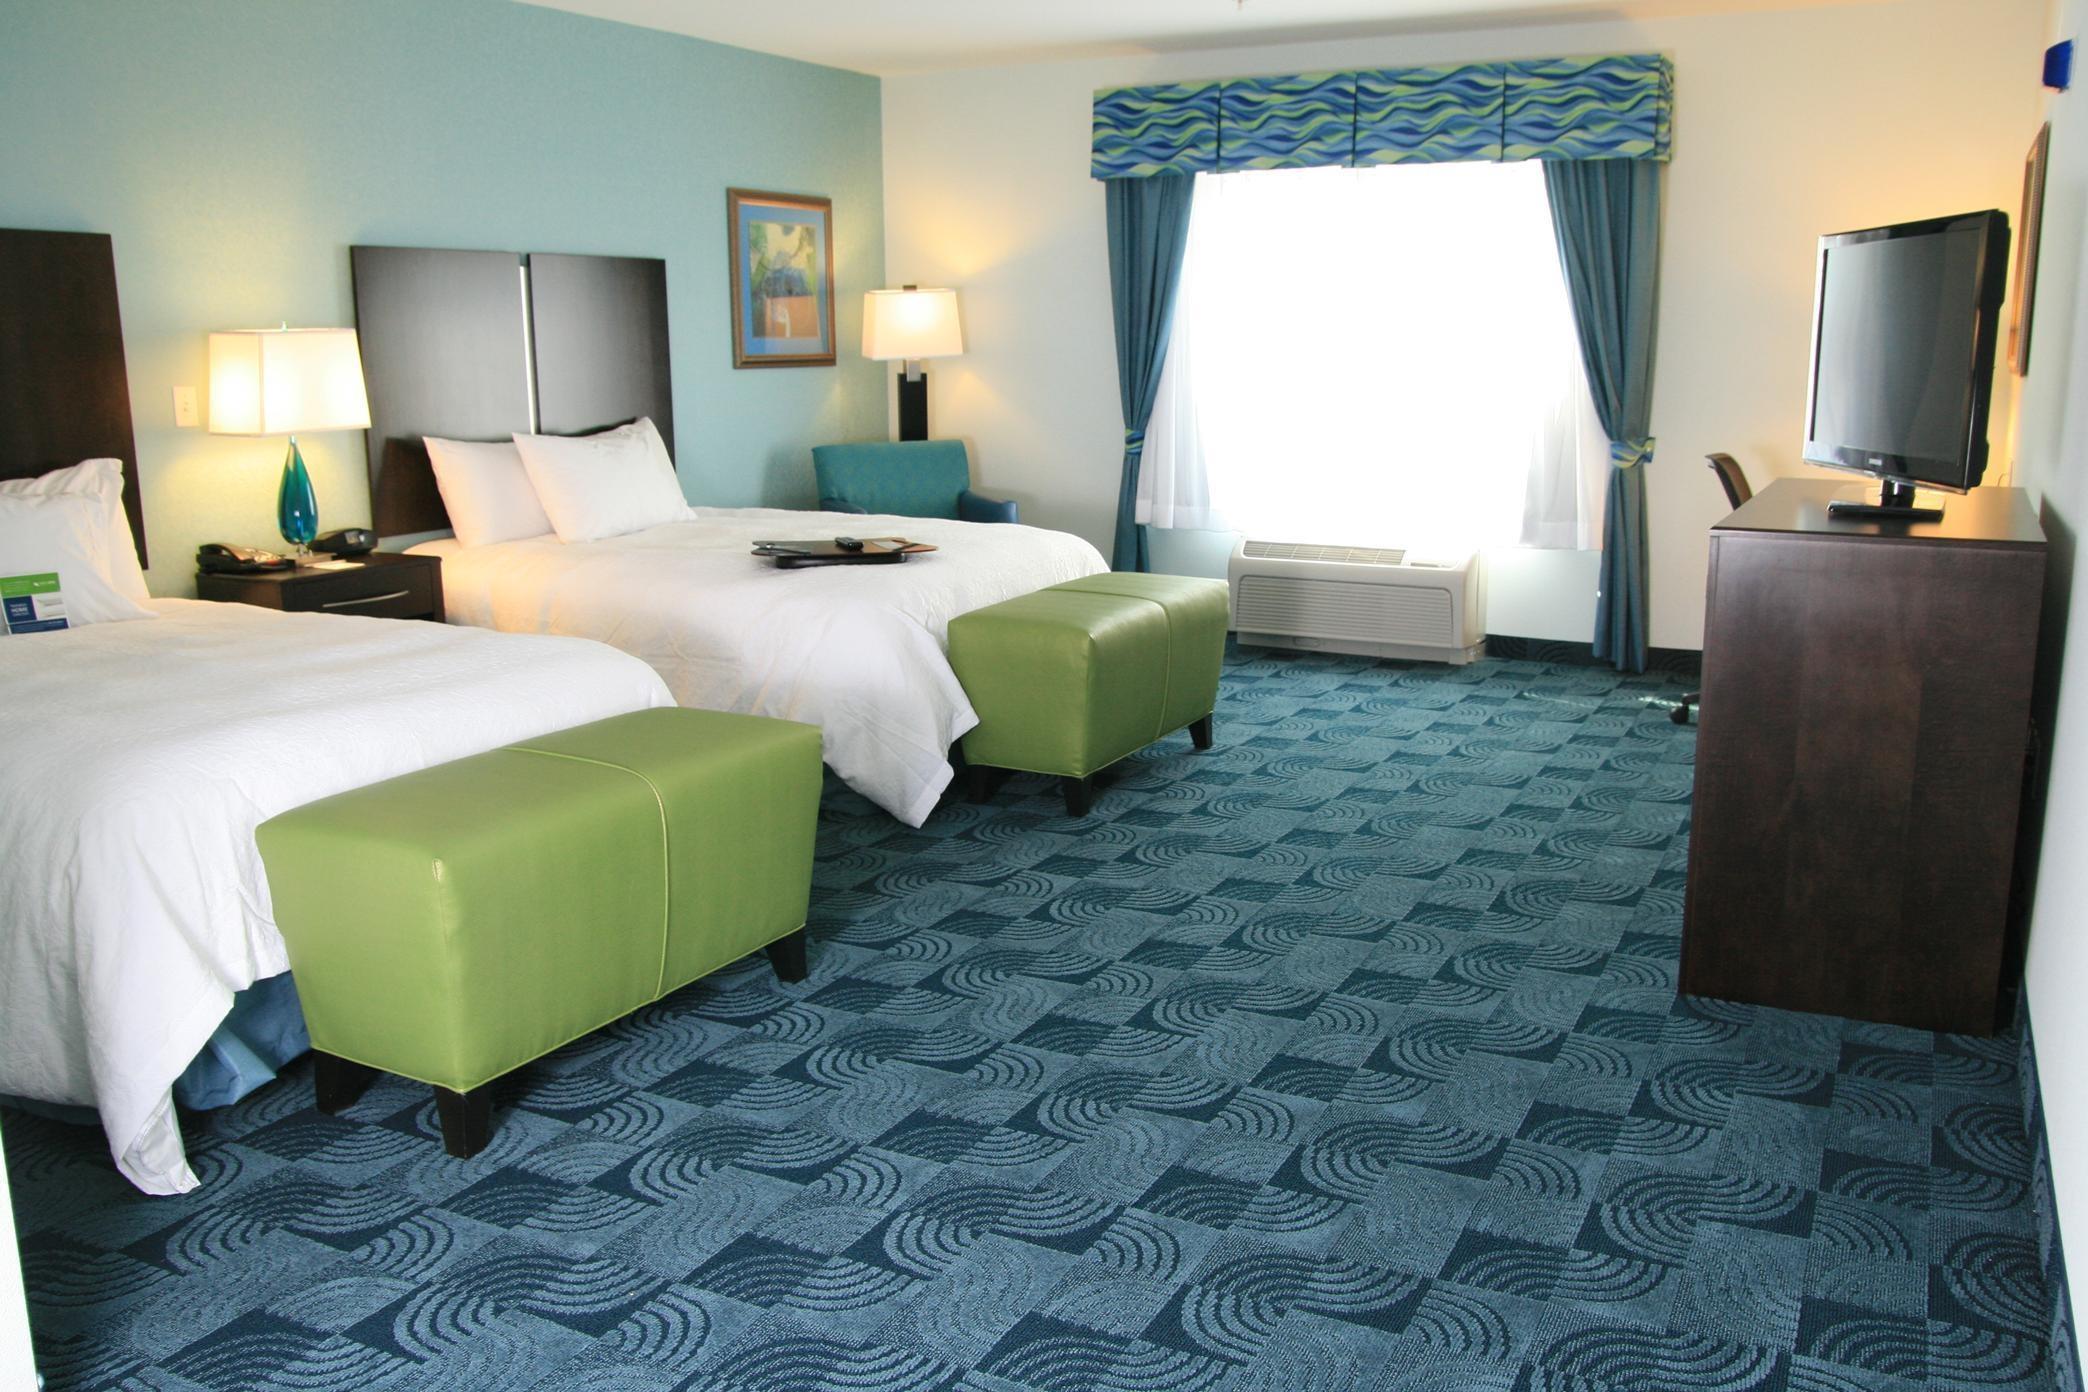 Hampton Inn & Suites Dallas/Lewisville-Vista Ridge Mall, TX image 15